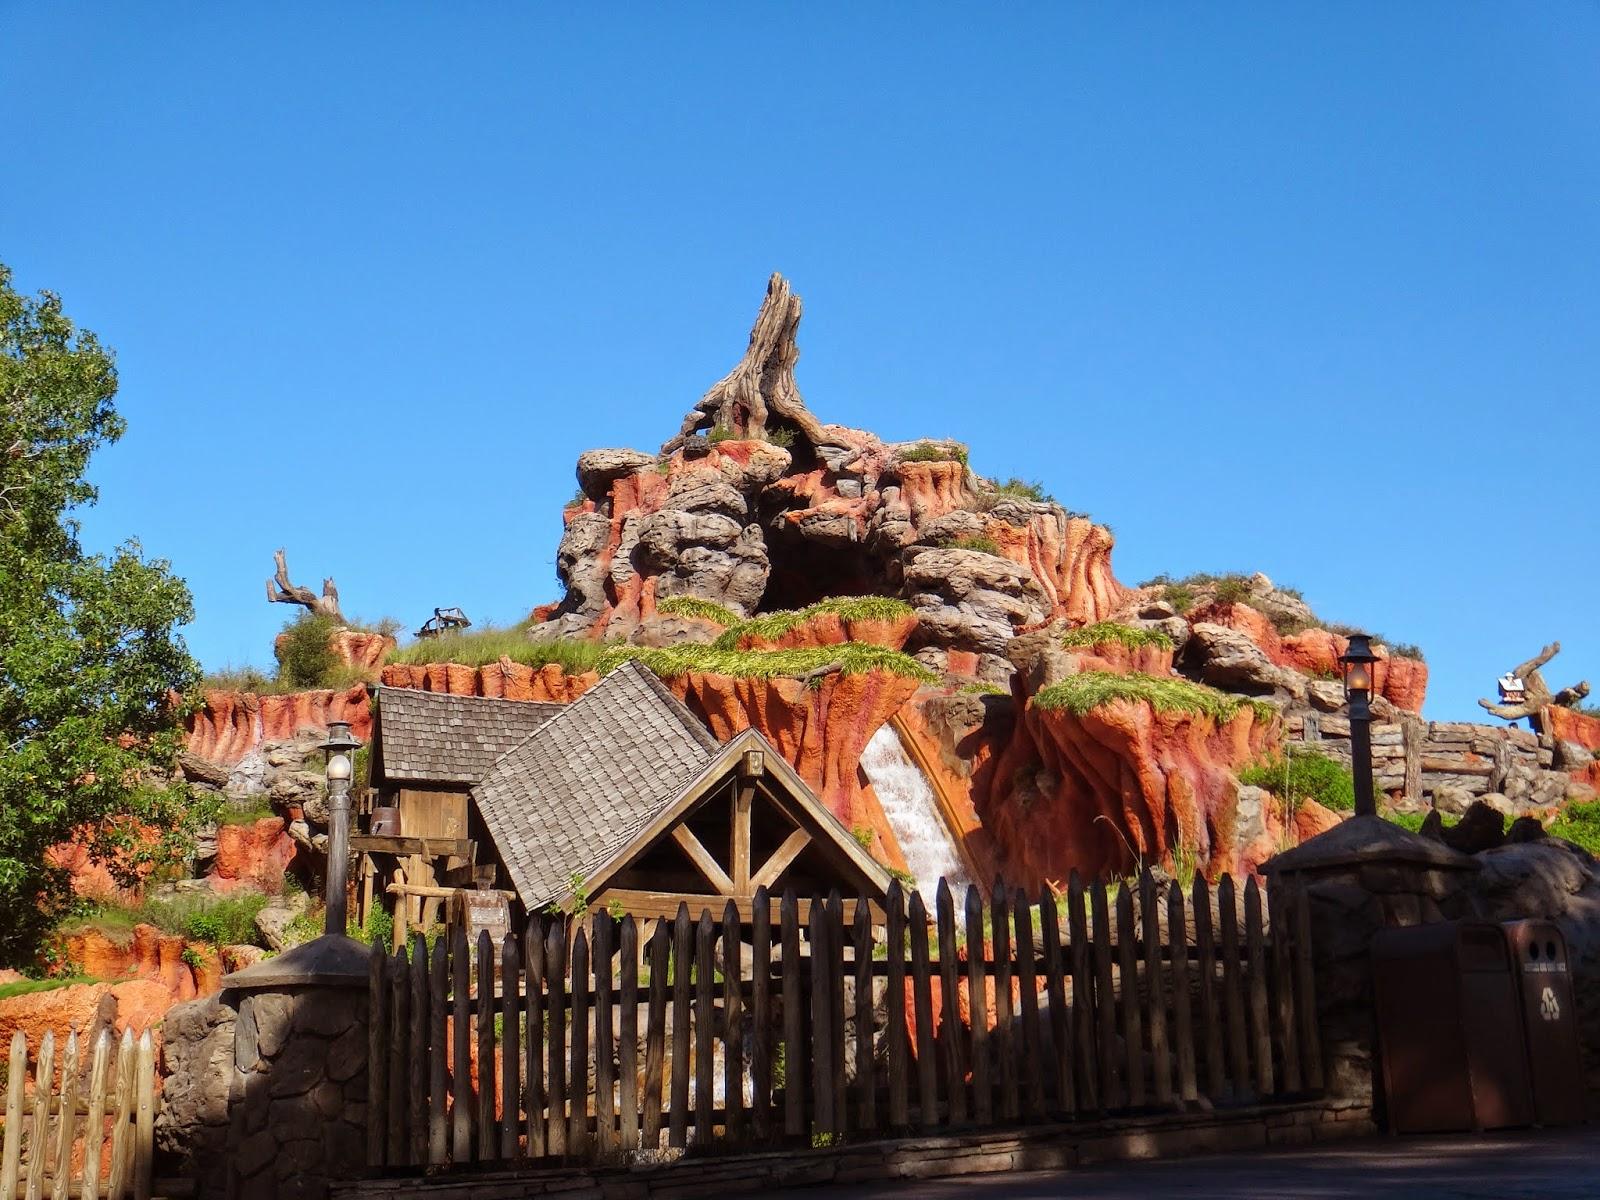 Walt Disney World Tourist: Frontierland, Magic Kingdom ...